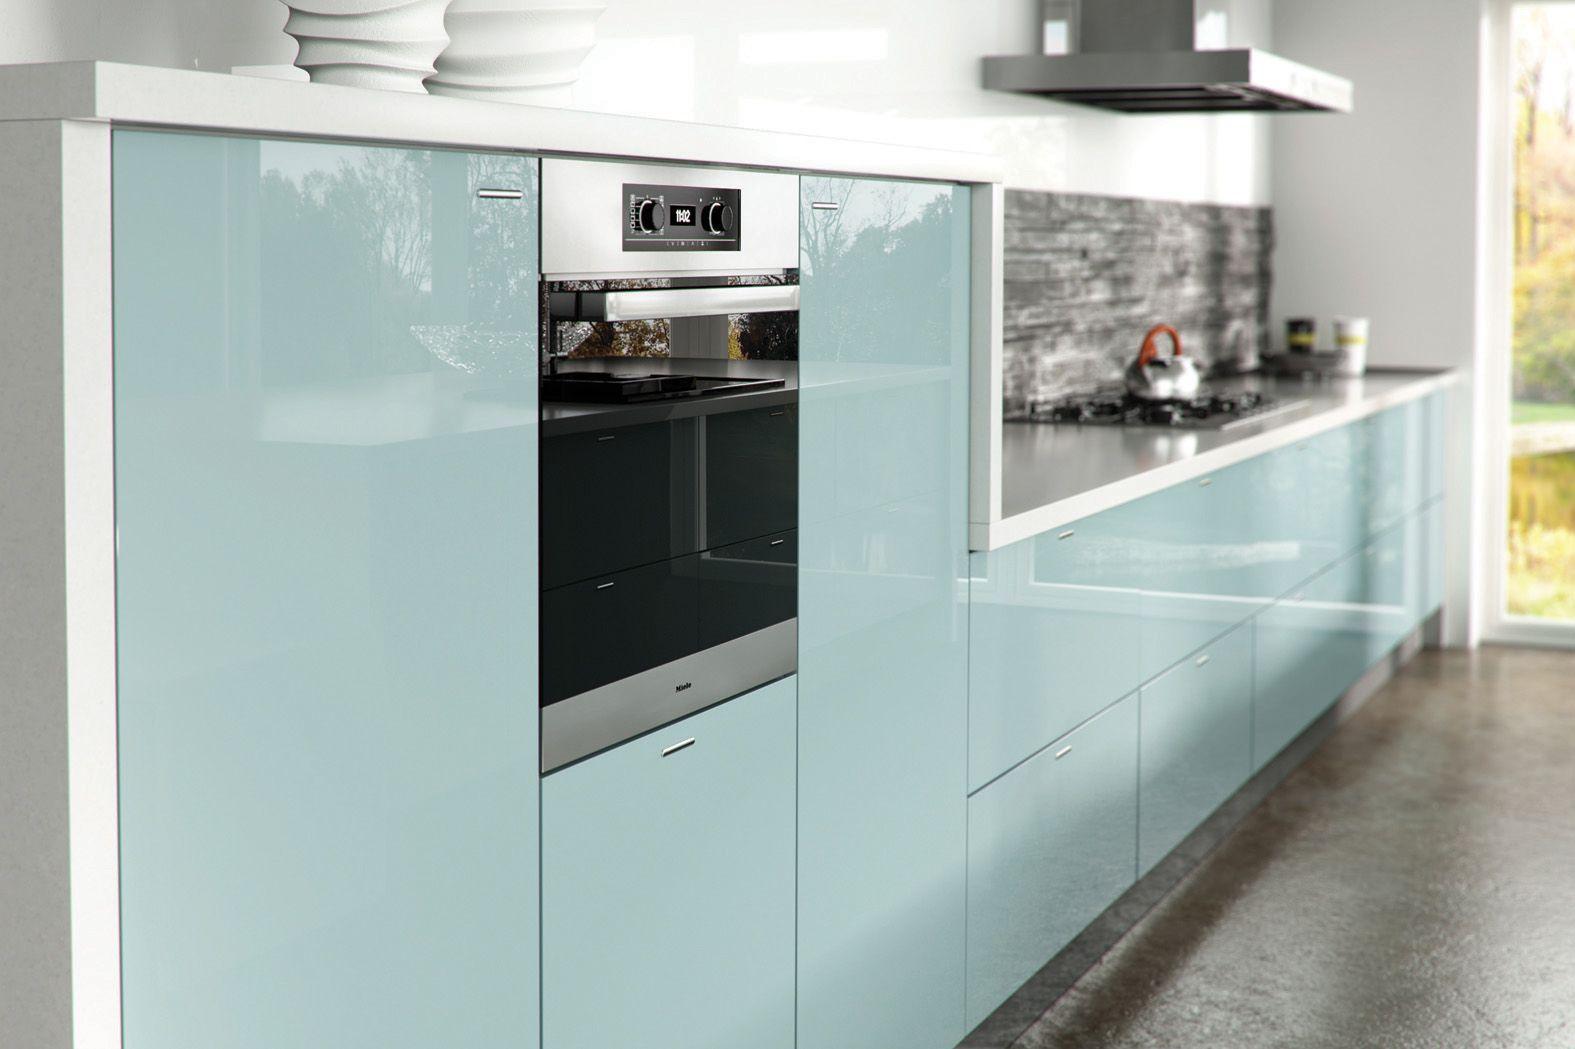 Metallicblue Acrylic High Gloss Kitchen Doors